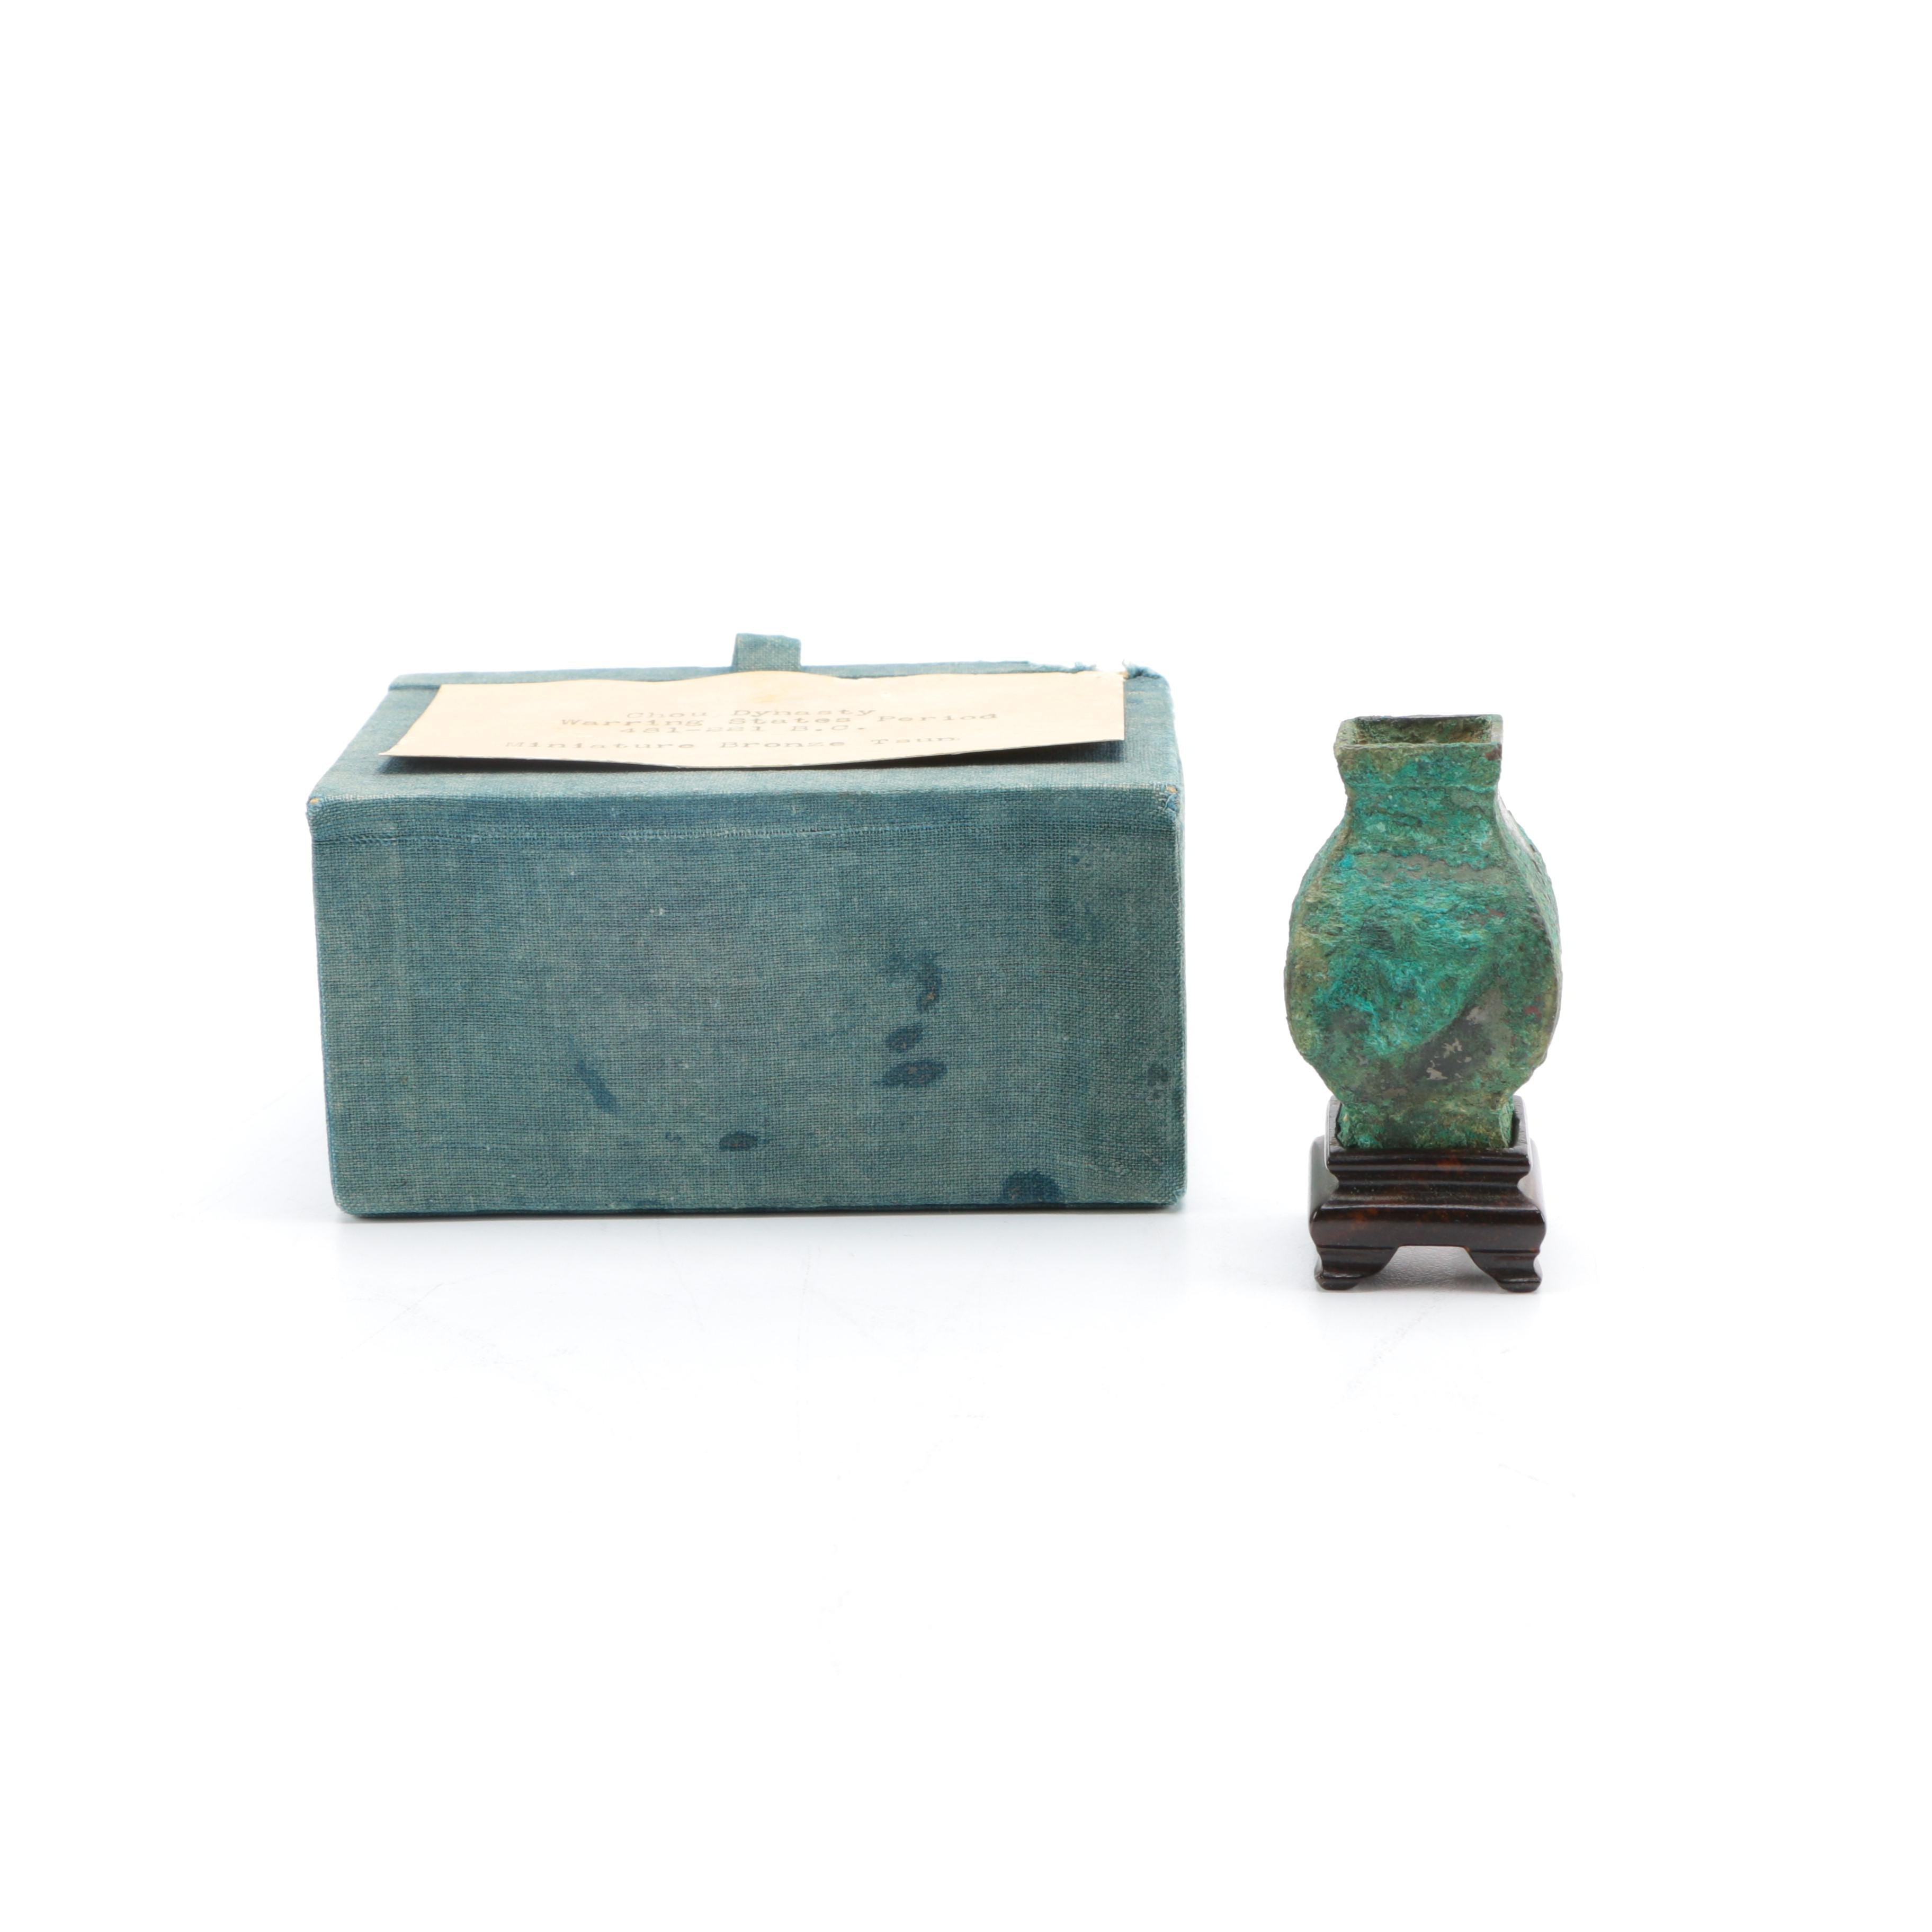 Chinese Miniature Bronze Fanghu Vase